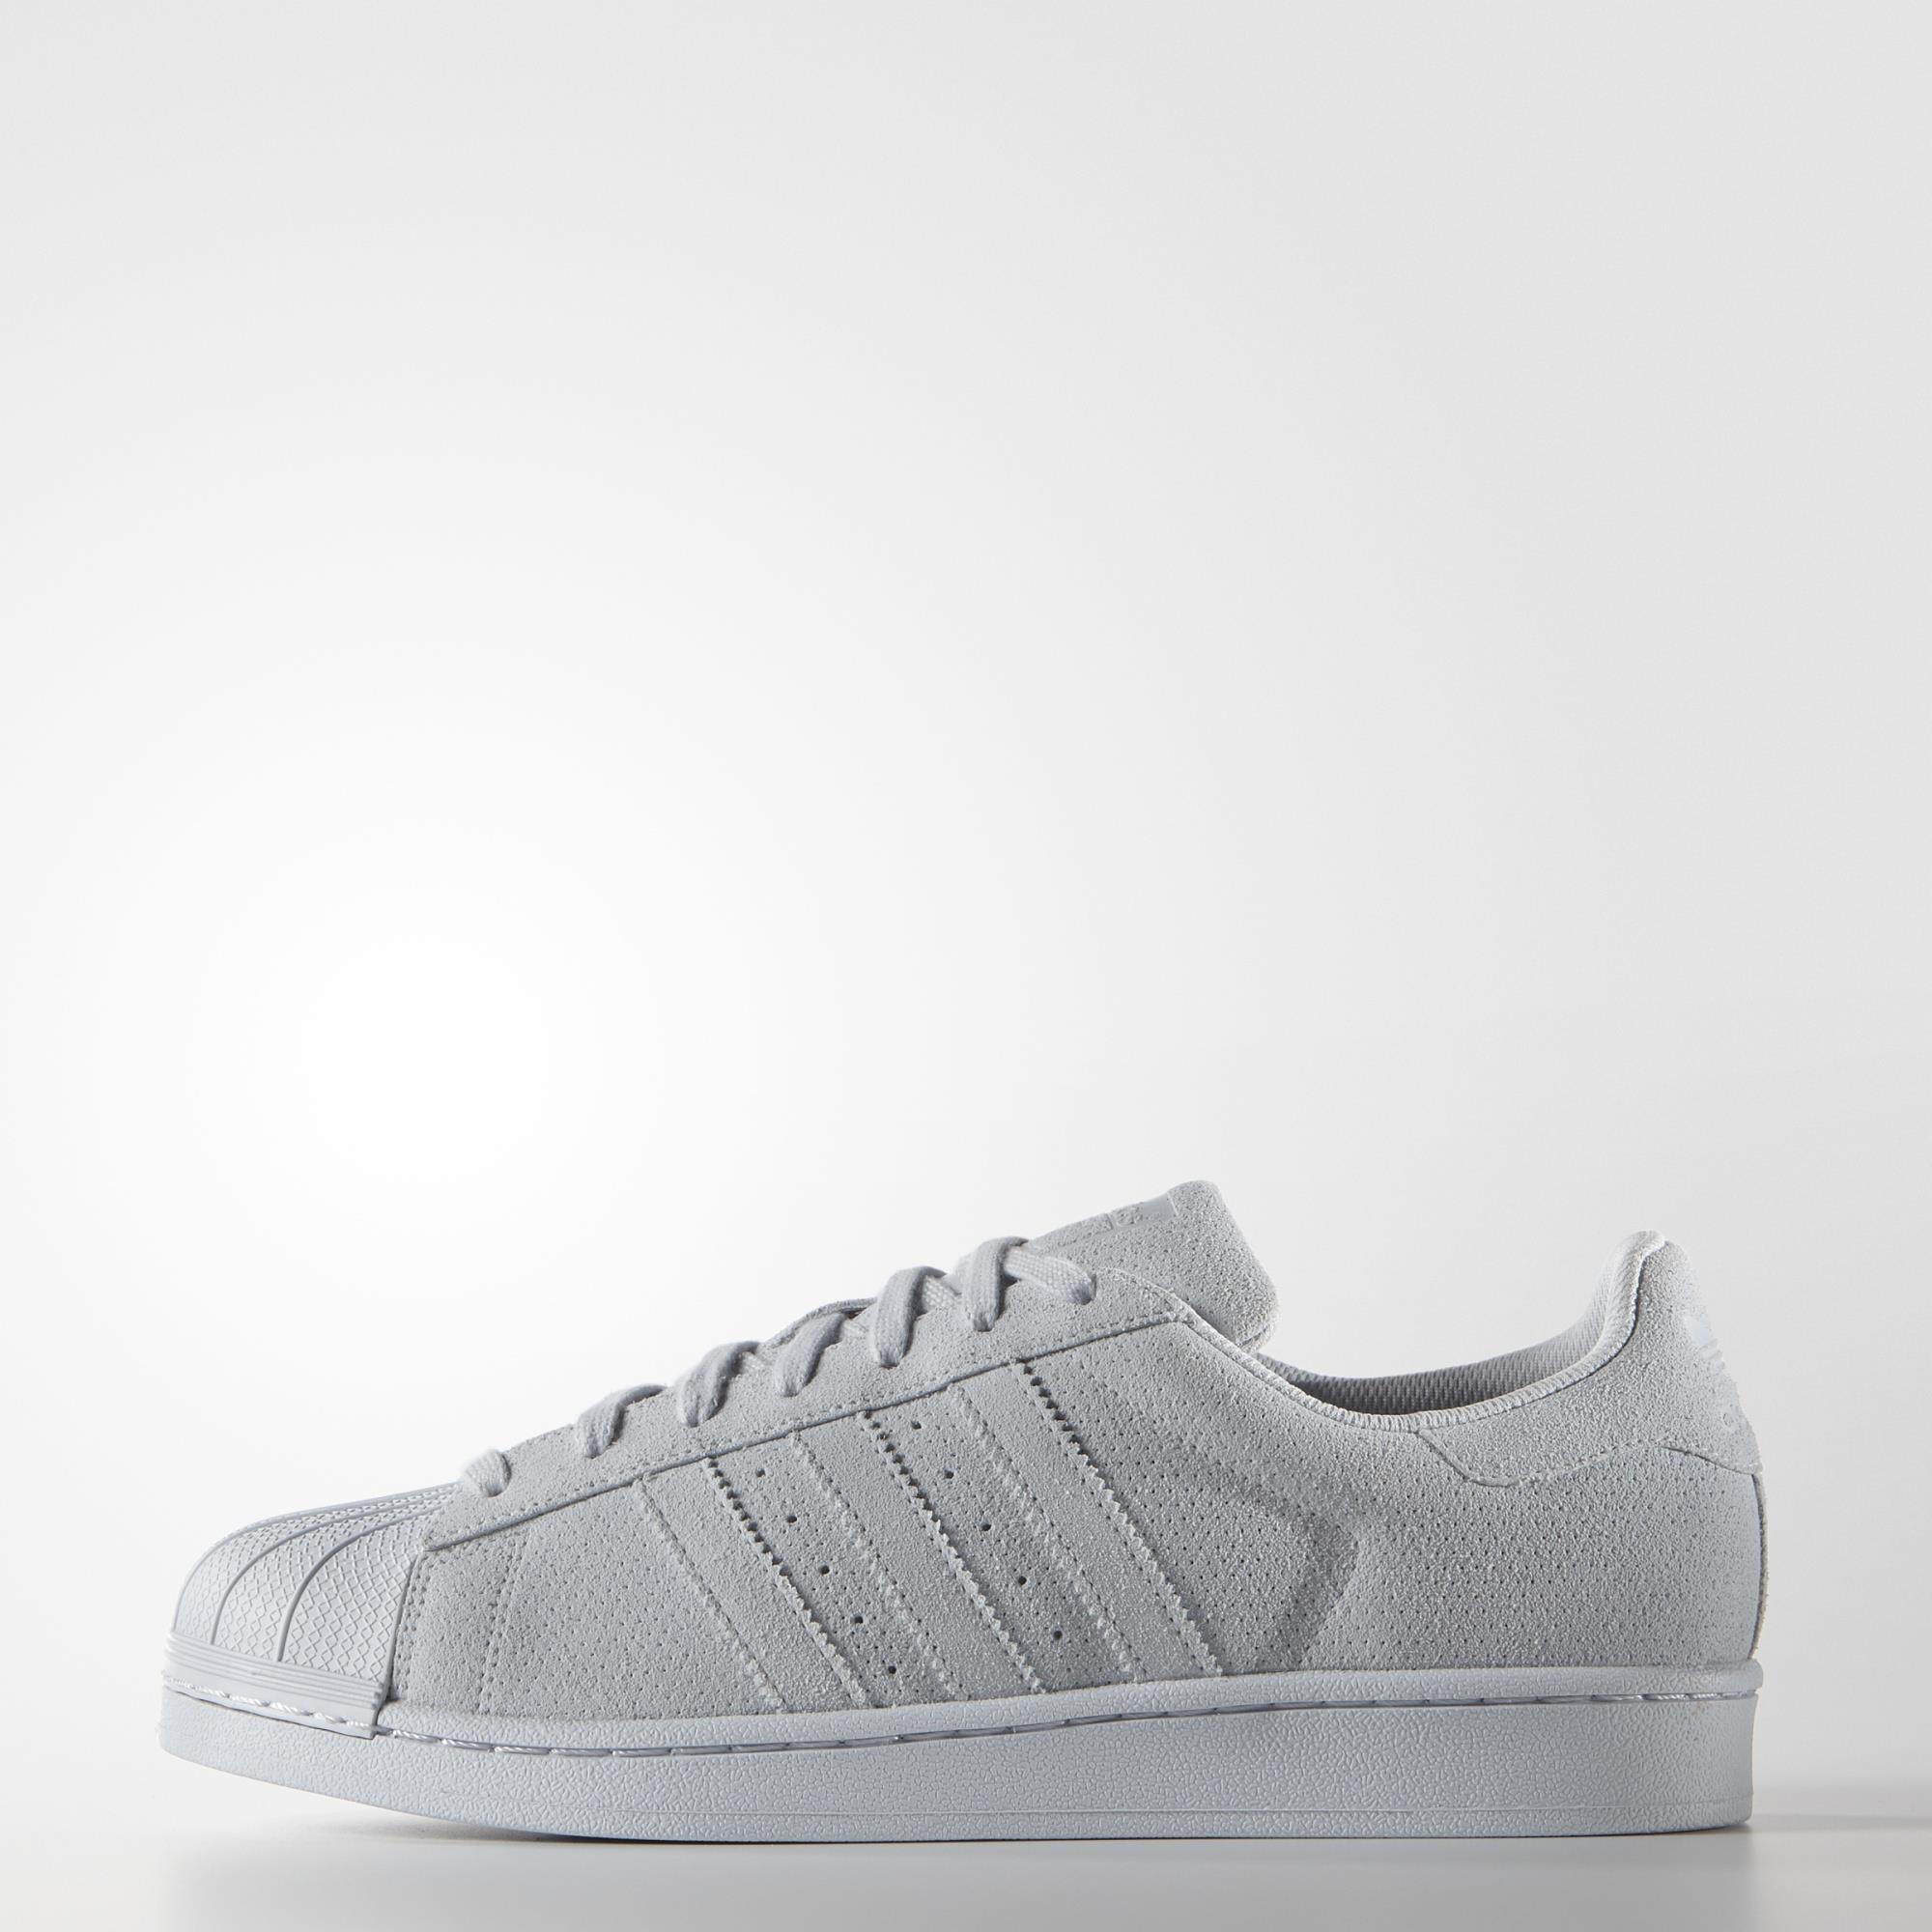 adidas Superstar RT shoes black